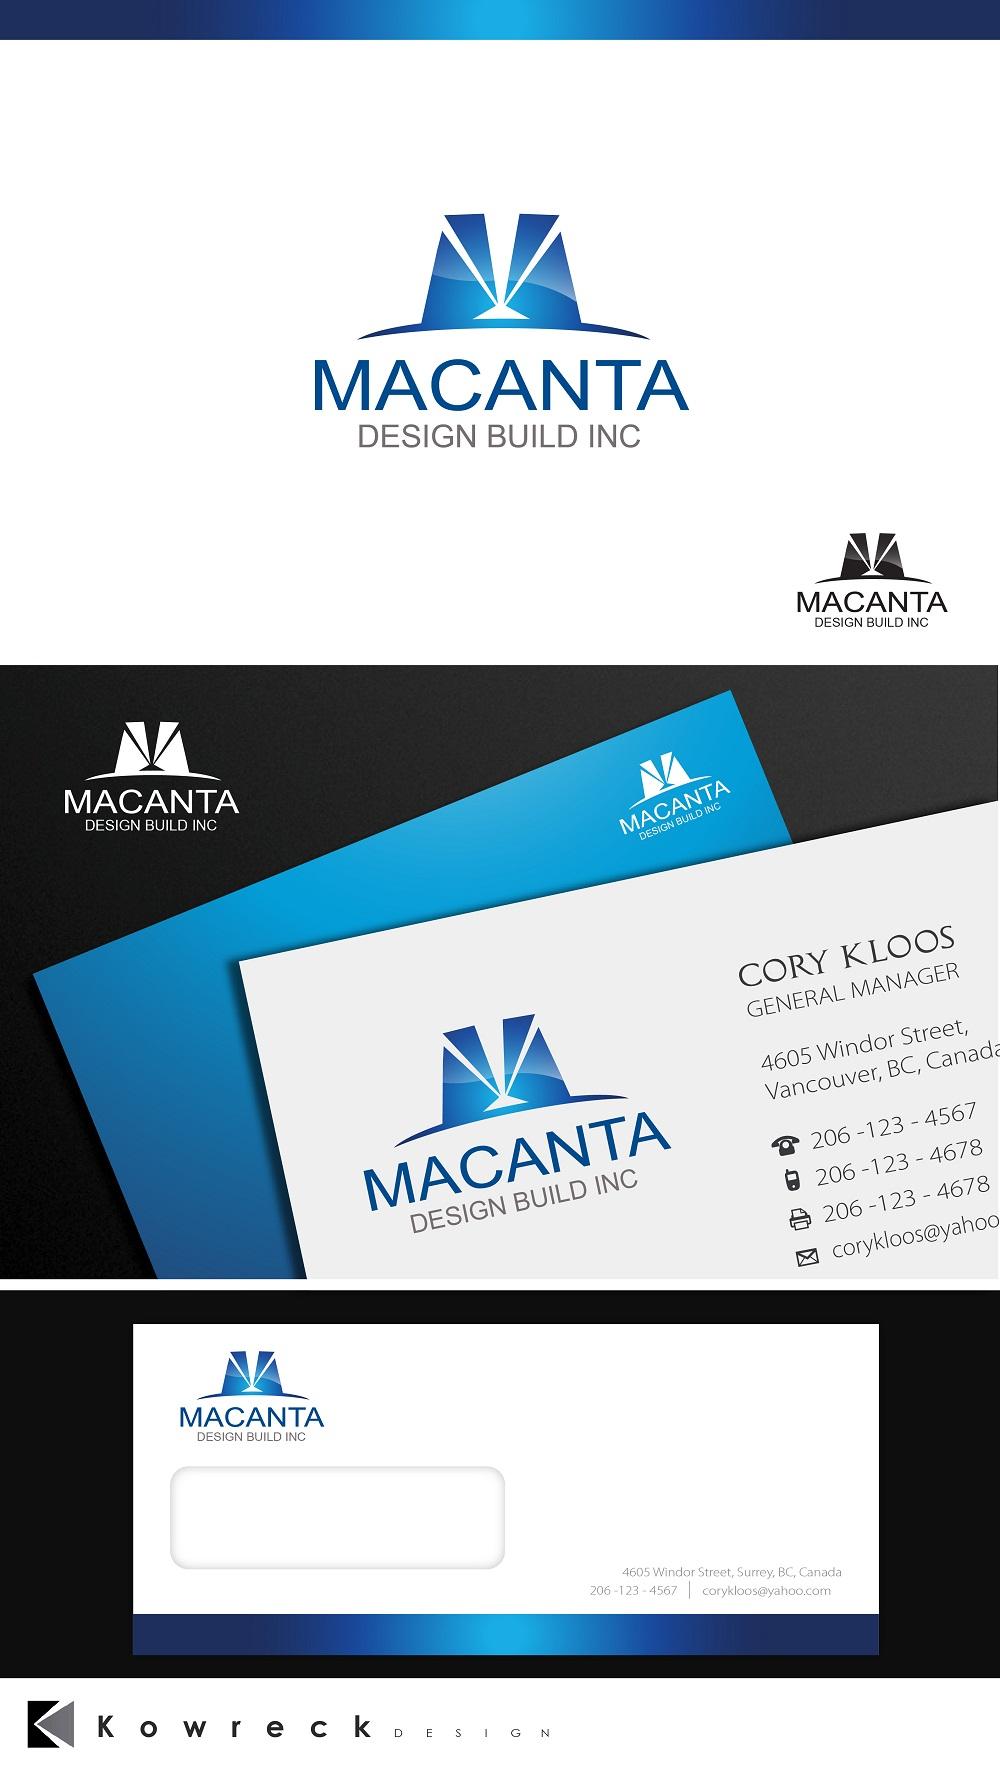 Logo Design by kowreck - Entry No. 177 in the Logo Design Contest Captivating Logo Design for Macanta Design Build Inc.